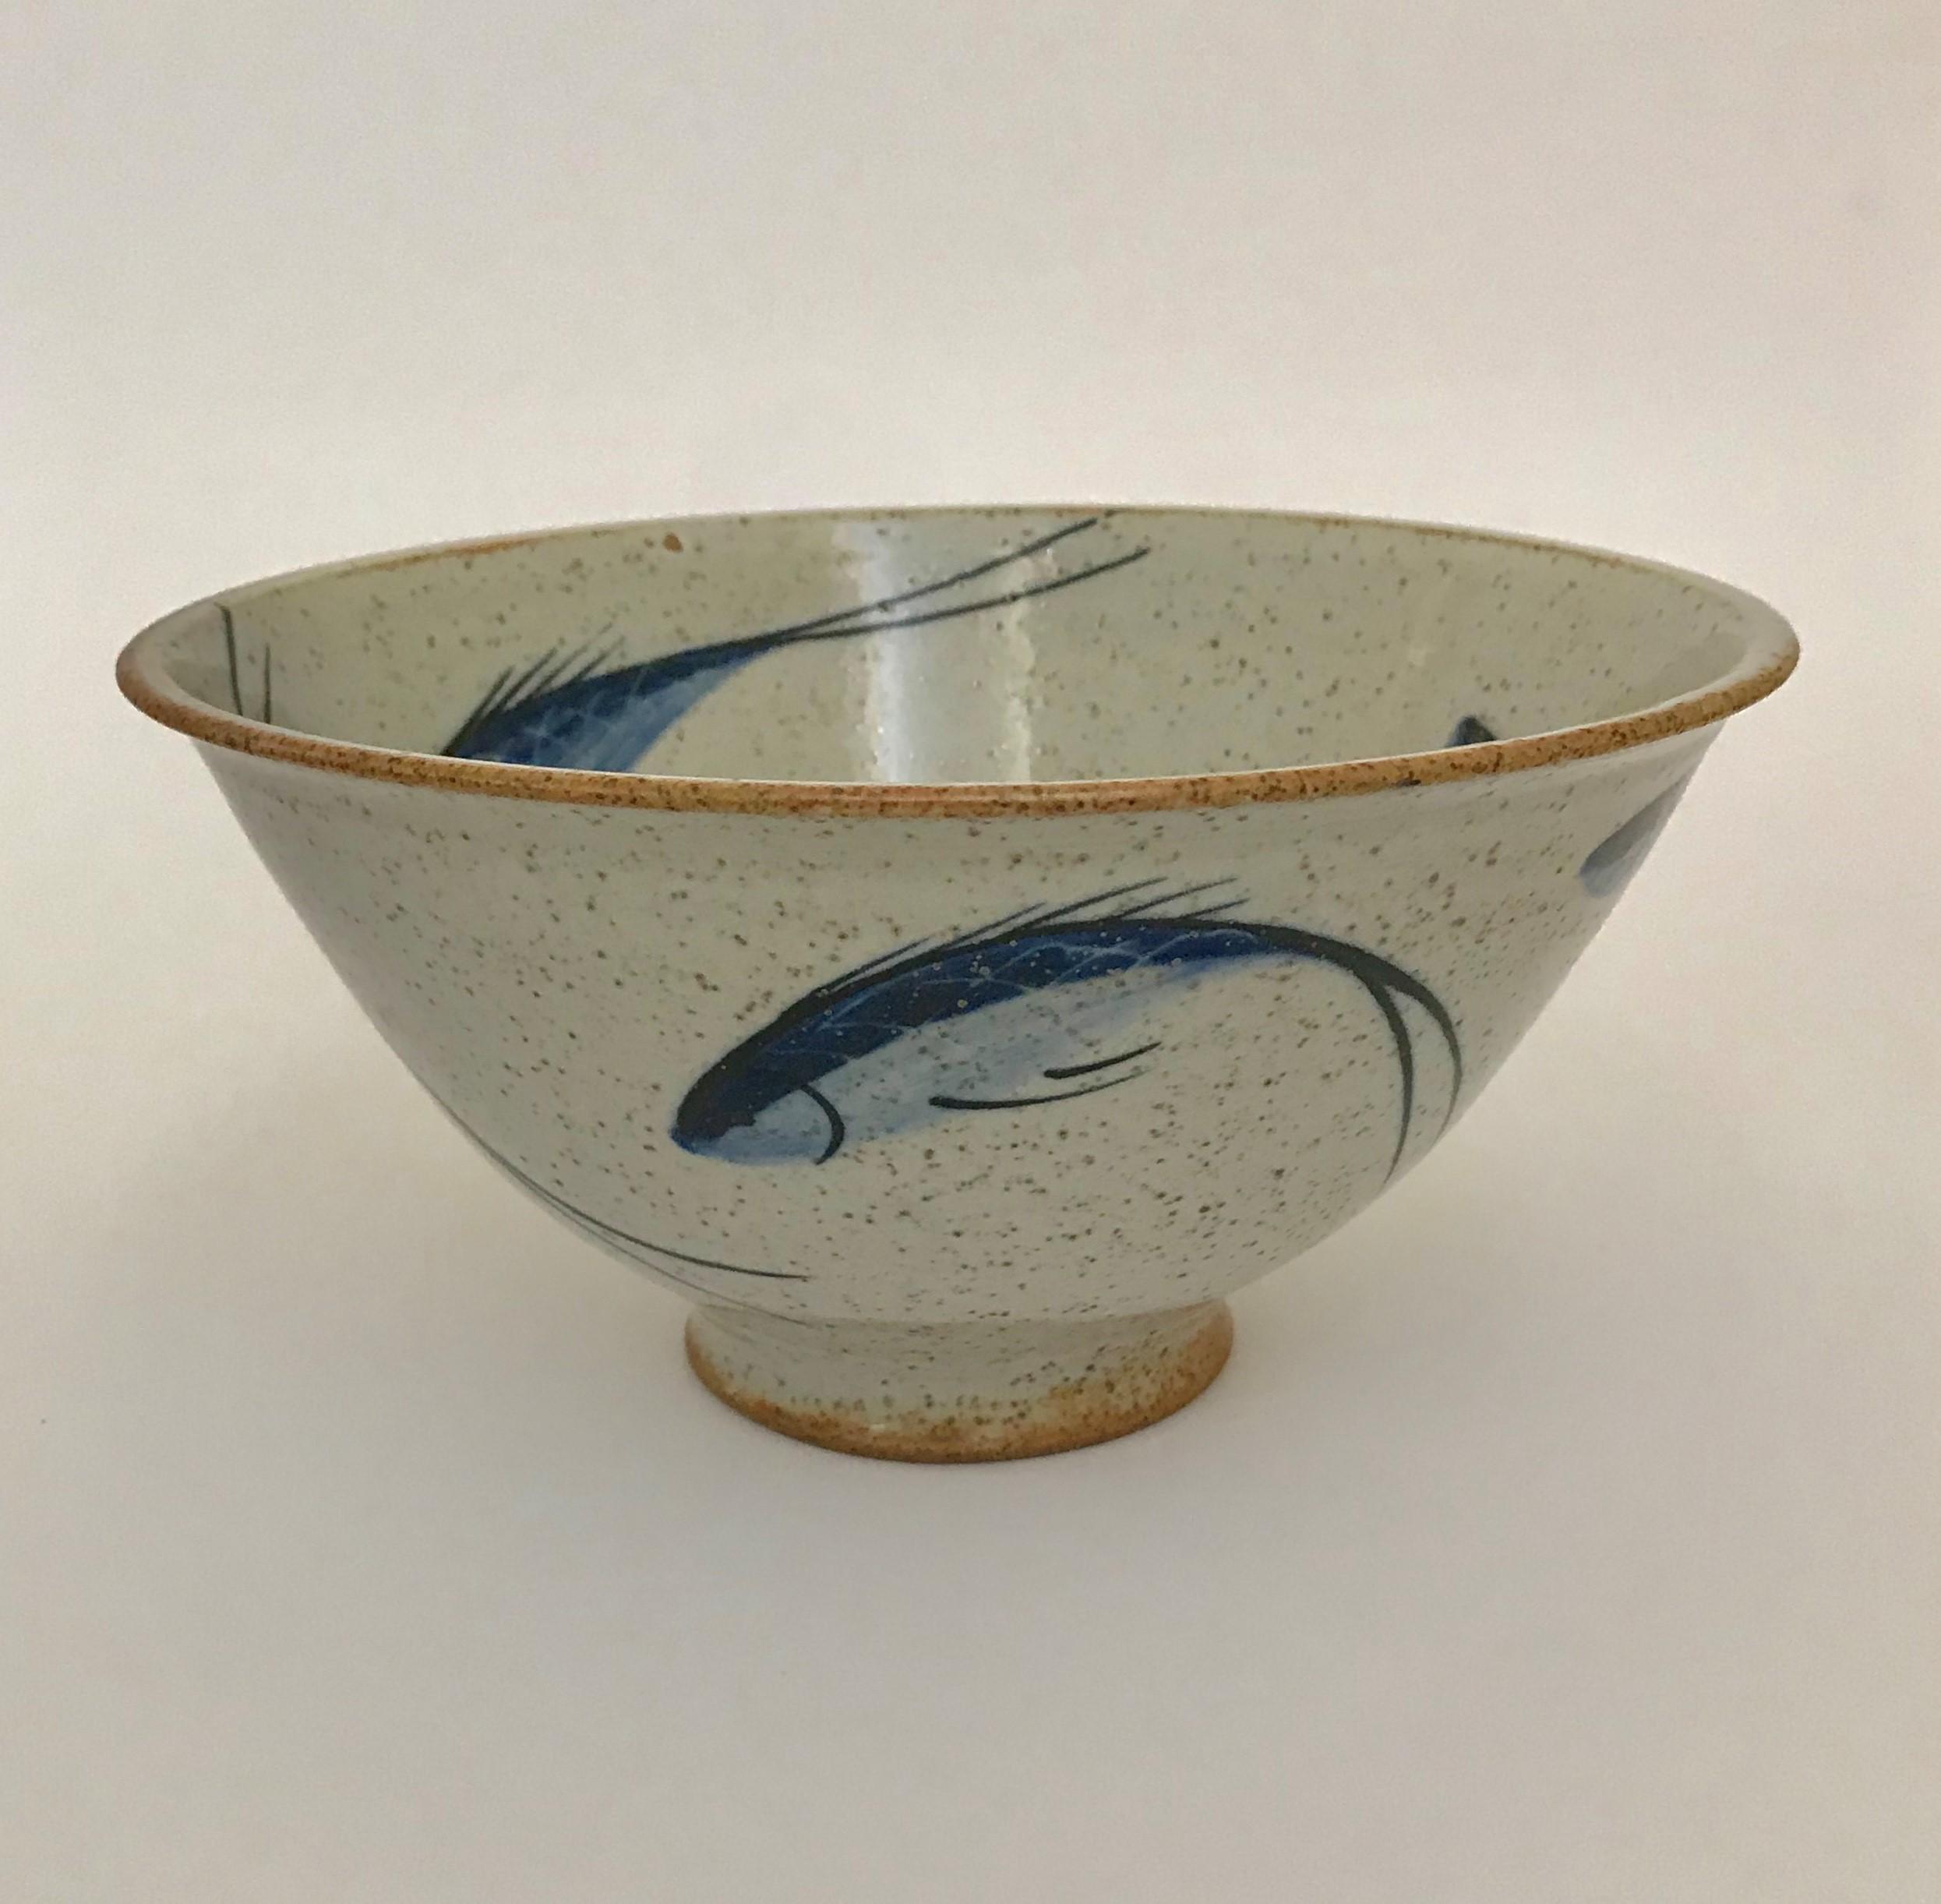 Medium bowl BF £80.00